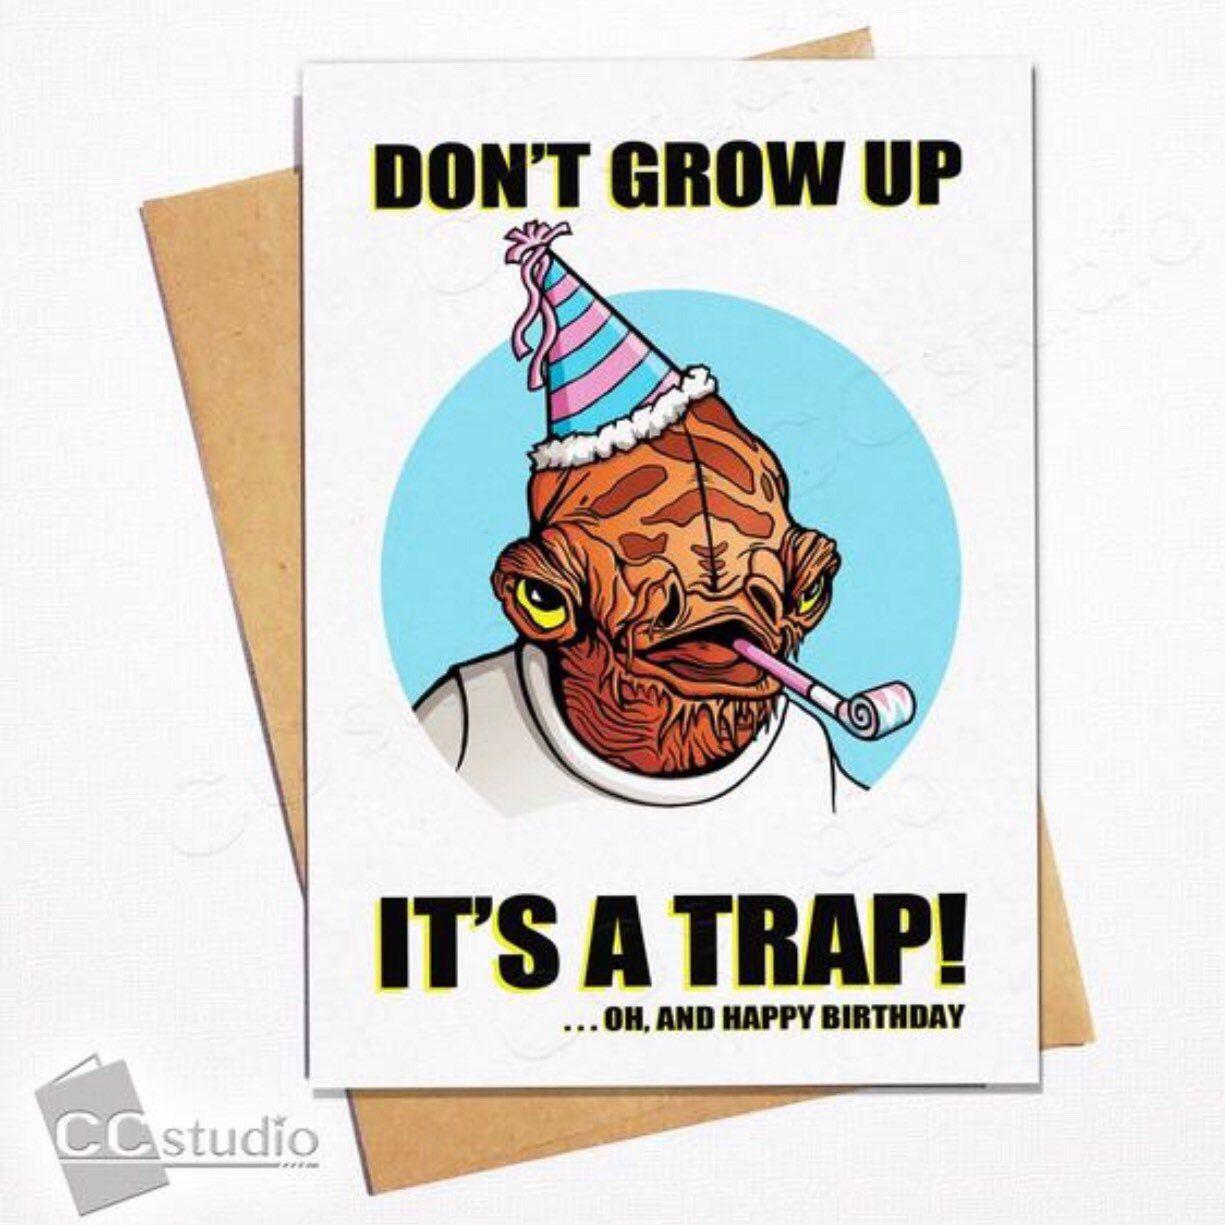 Star Wars Birthday Card Nerdy Birthday Card Don T Grow Etsy Happy Birthday Cards Printable Birthday Cards For Friends Star Wars Birthday